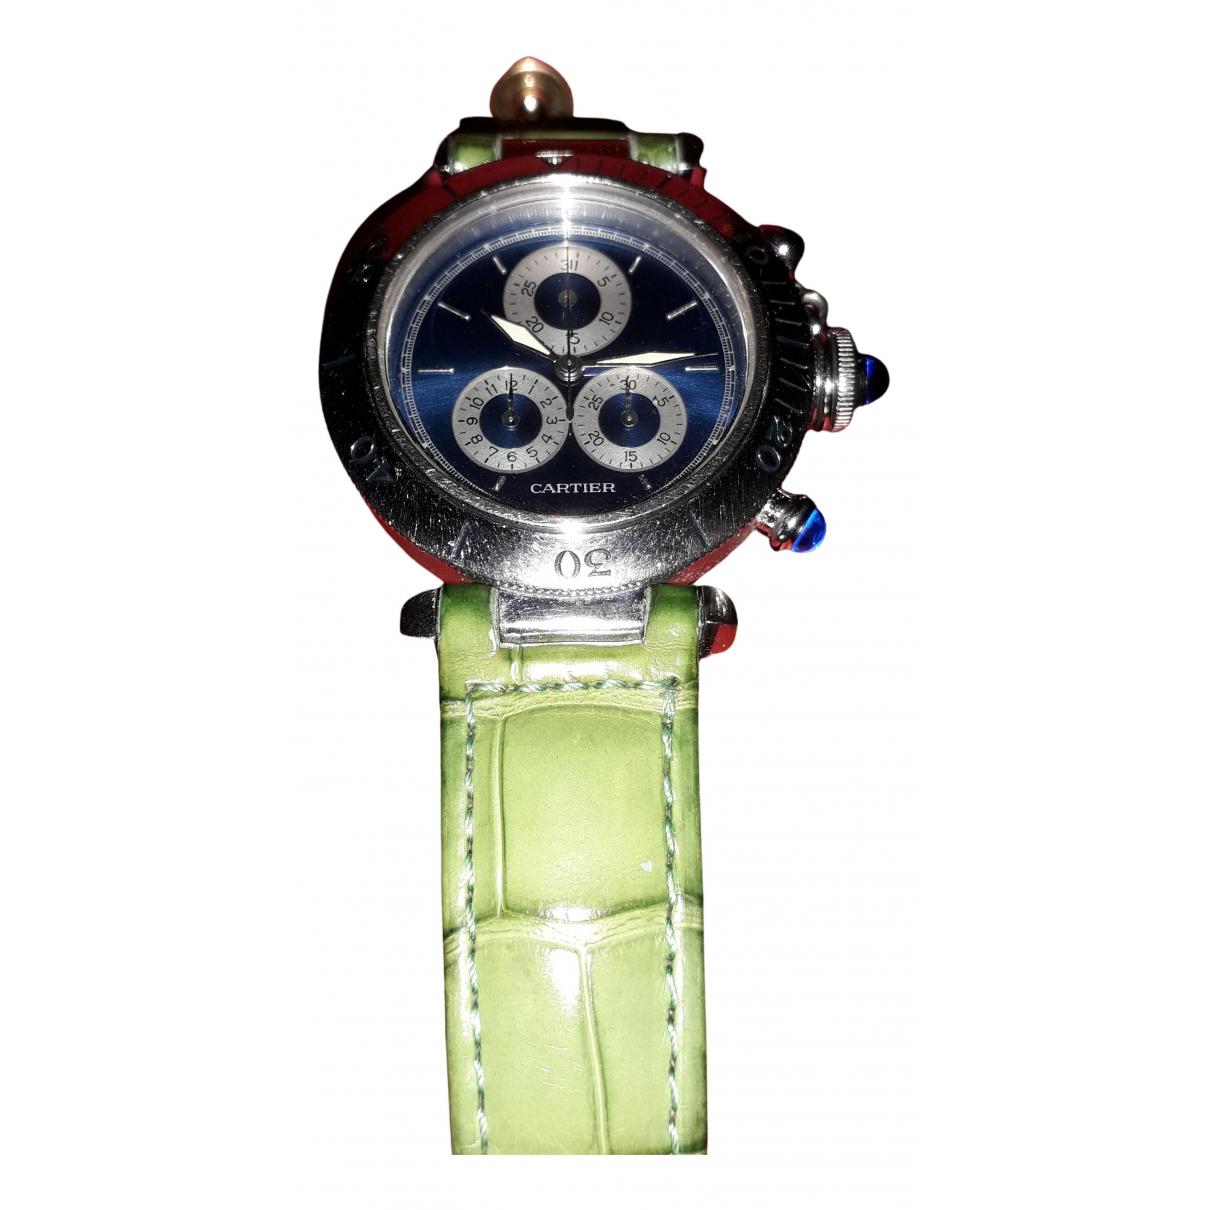 Cartier Pasha Chronographe Uhr in  Silber Stahl